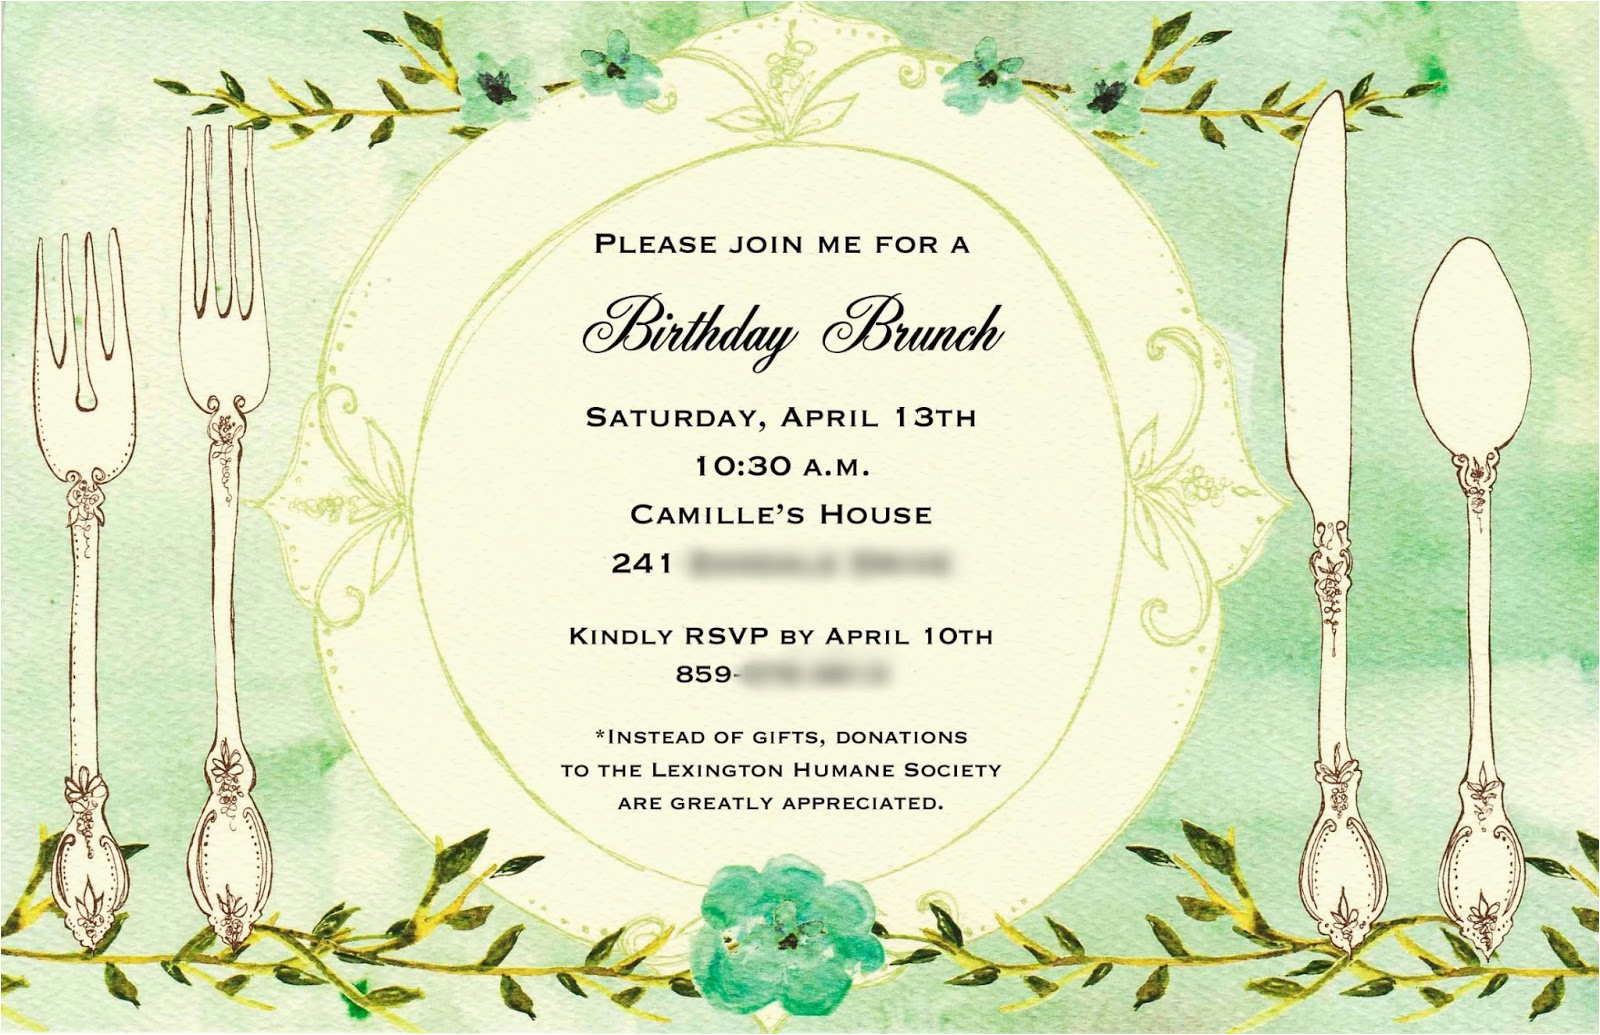 Birthday Brunch Invitation Wording For Lunch